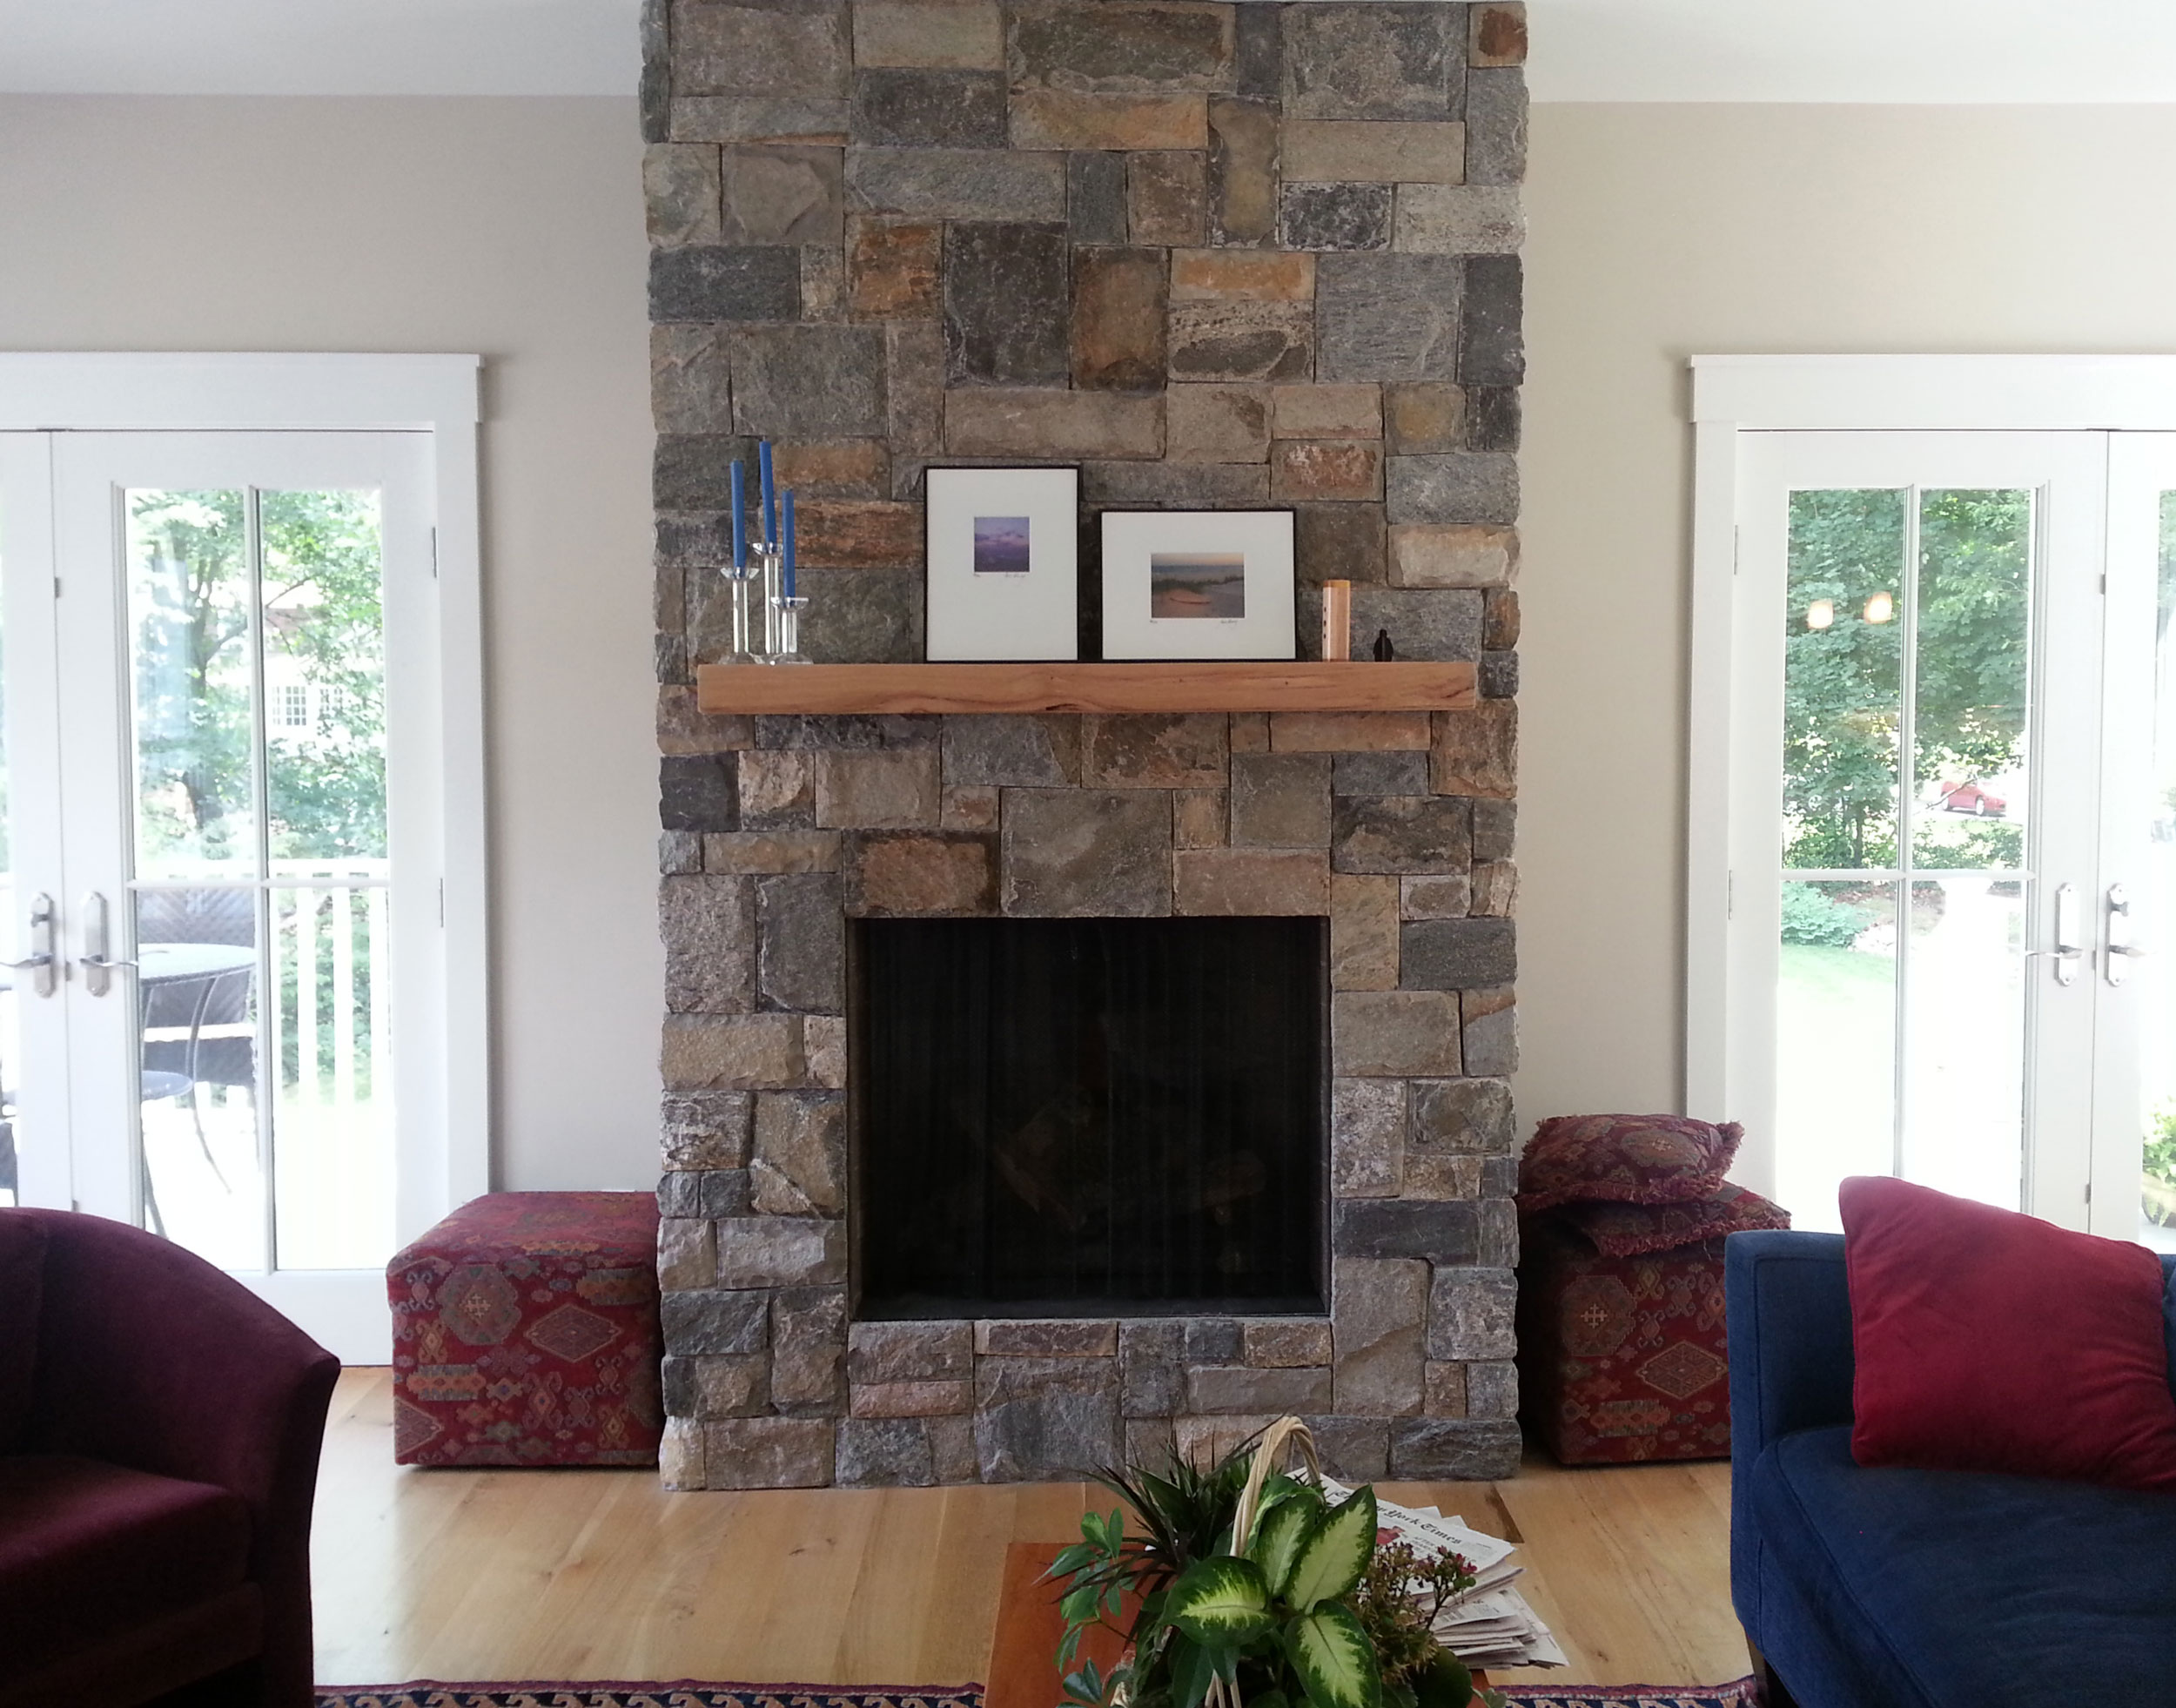 Westport-farmhouse-stone-fireplace.jpg